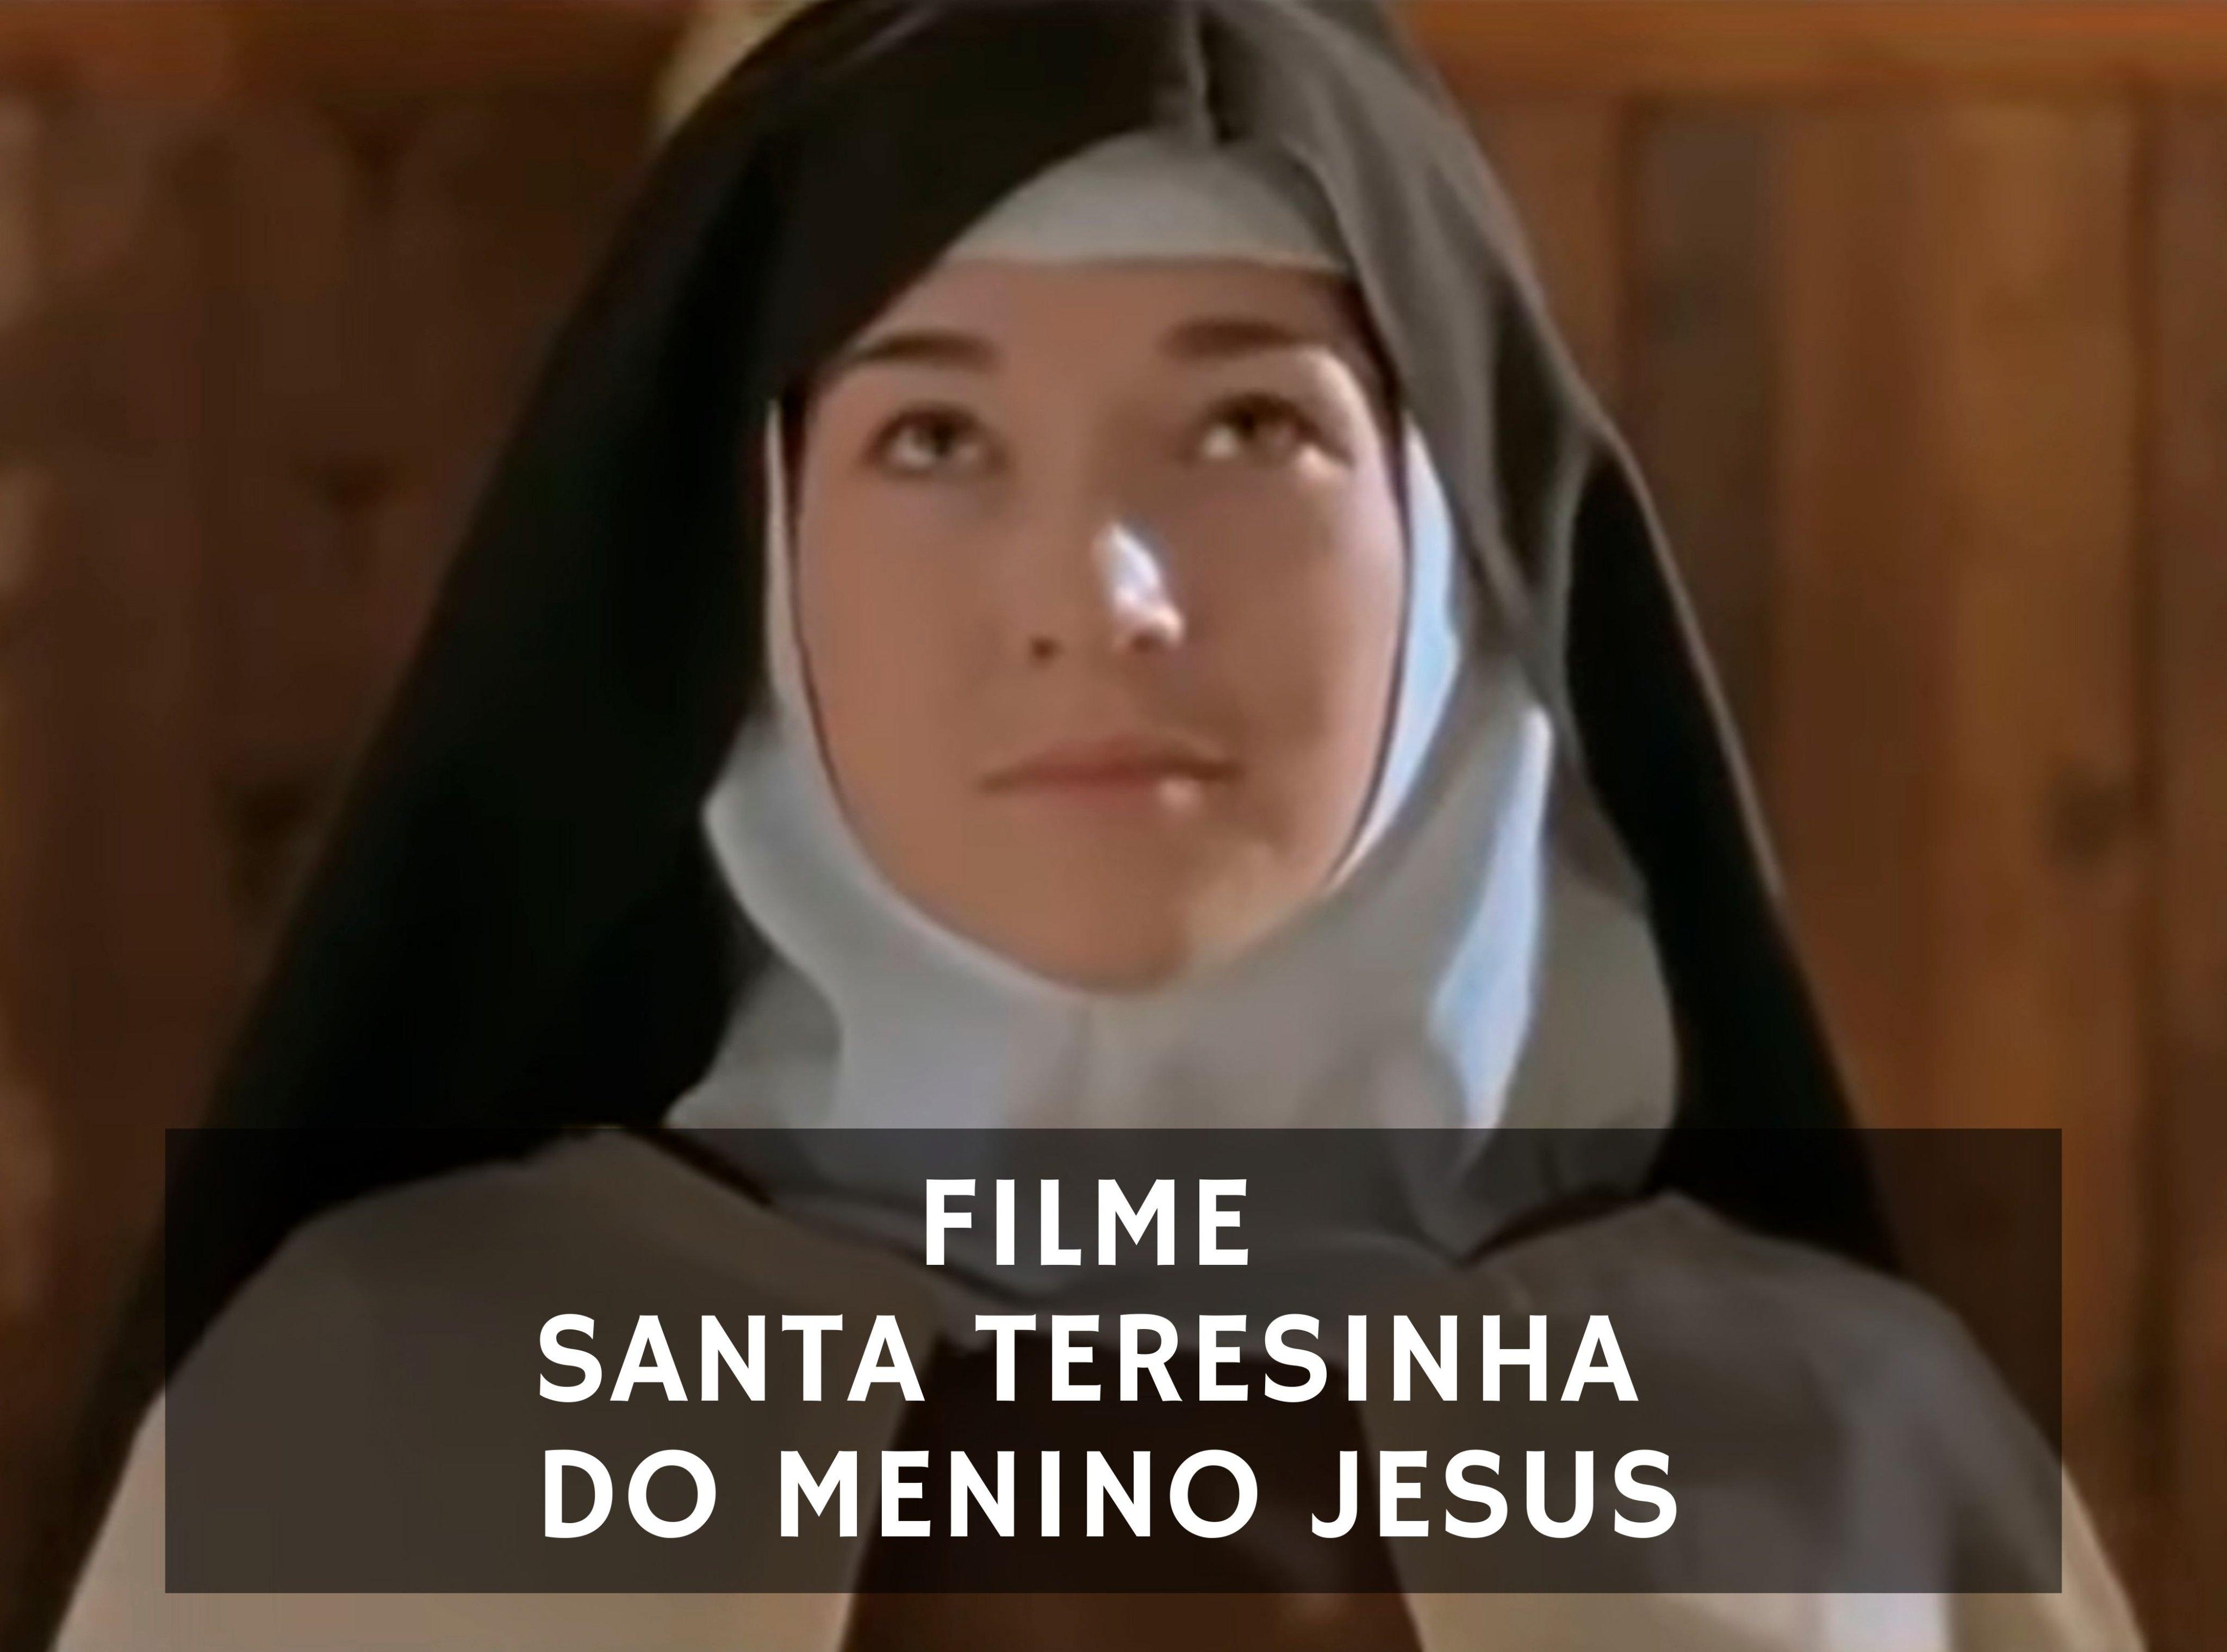 Filme de Santa Teresinha do Menino Jesus